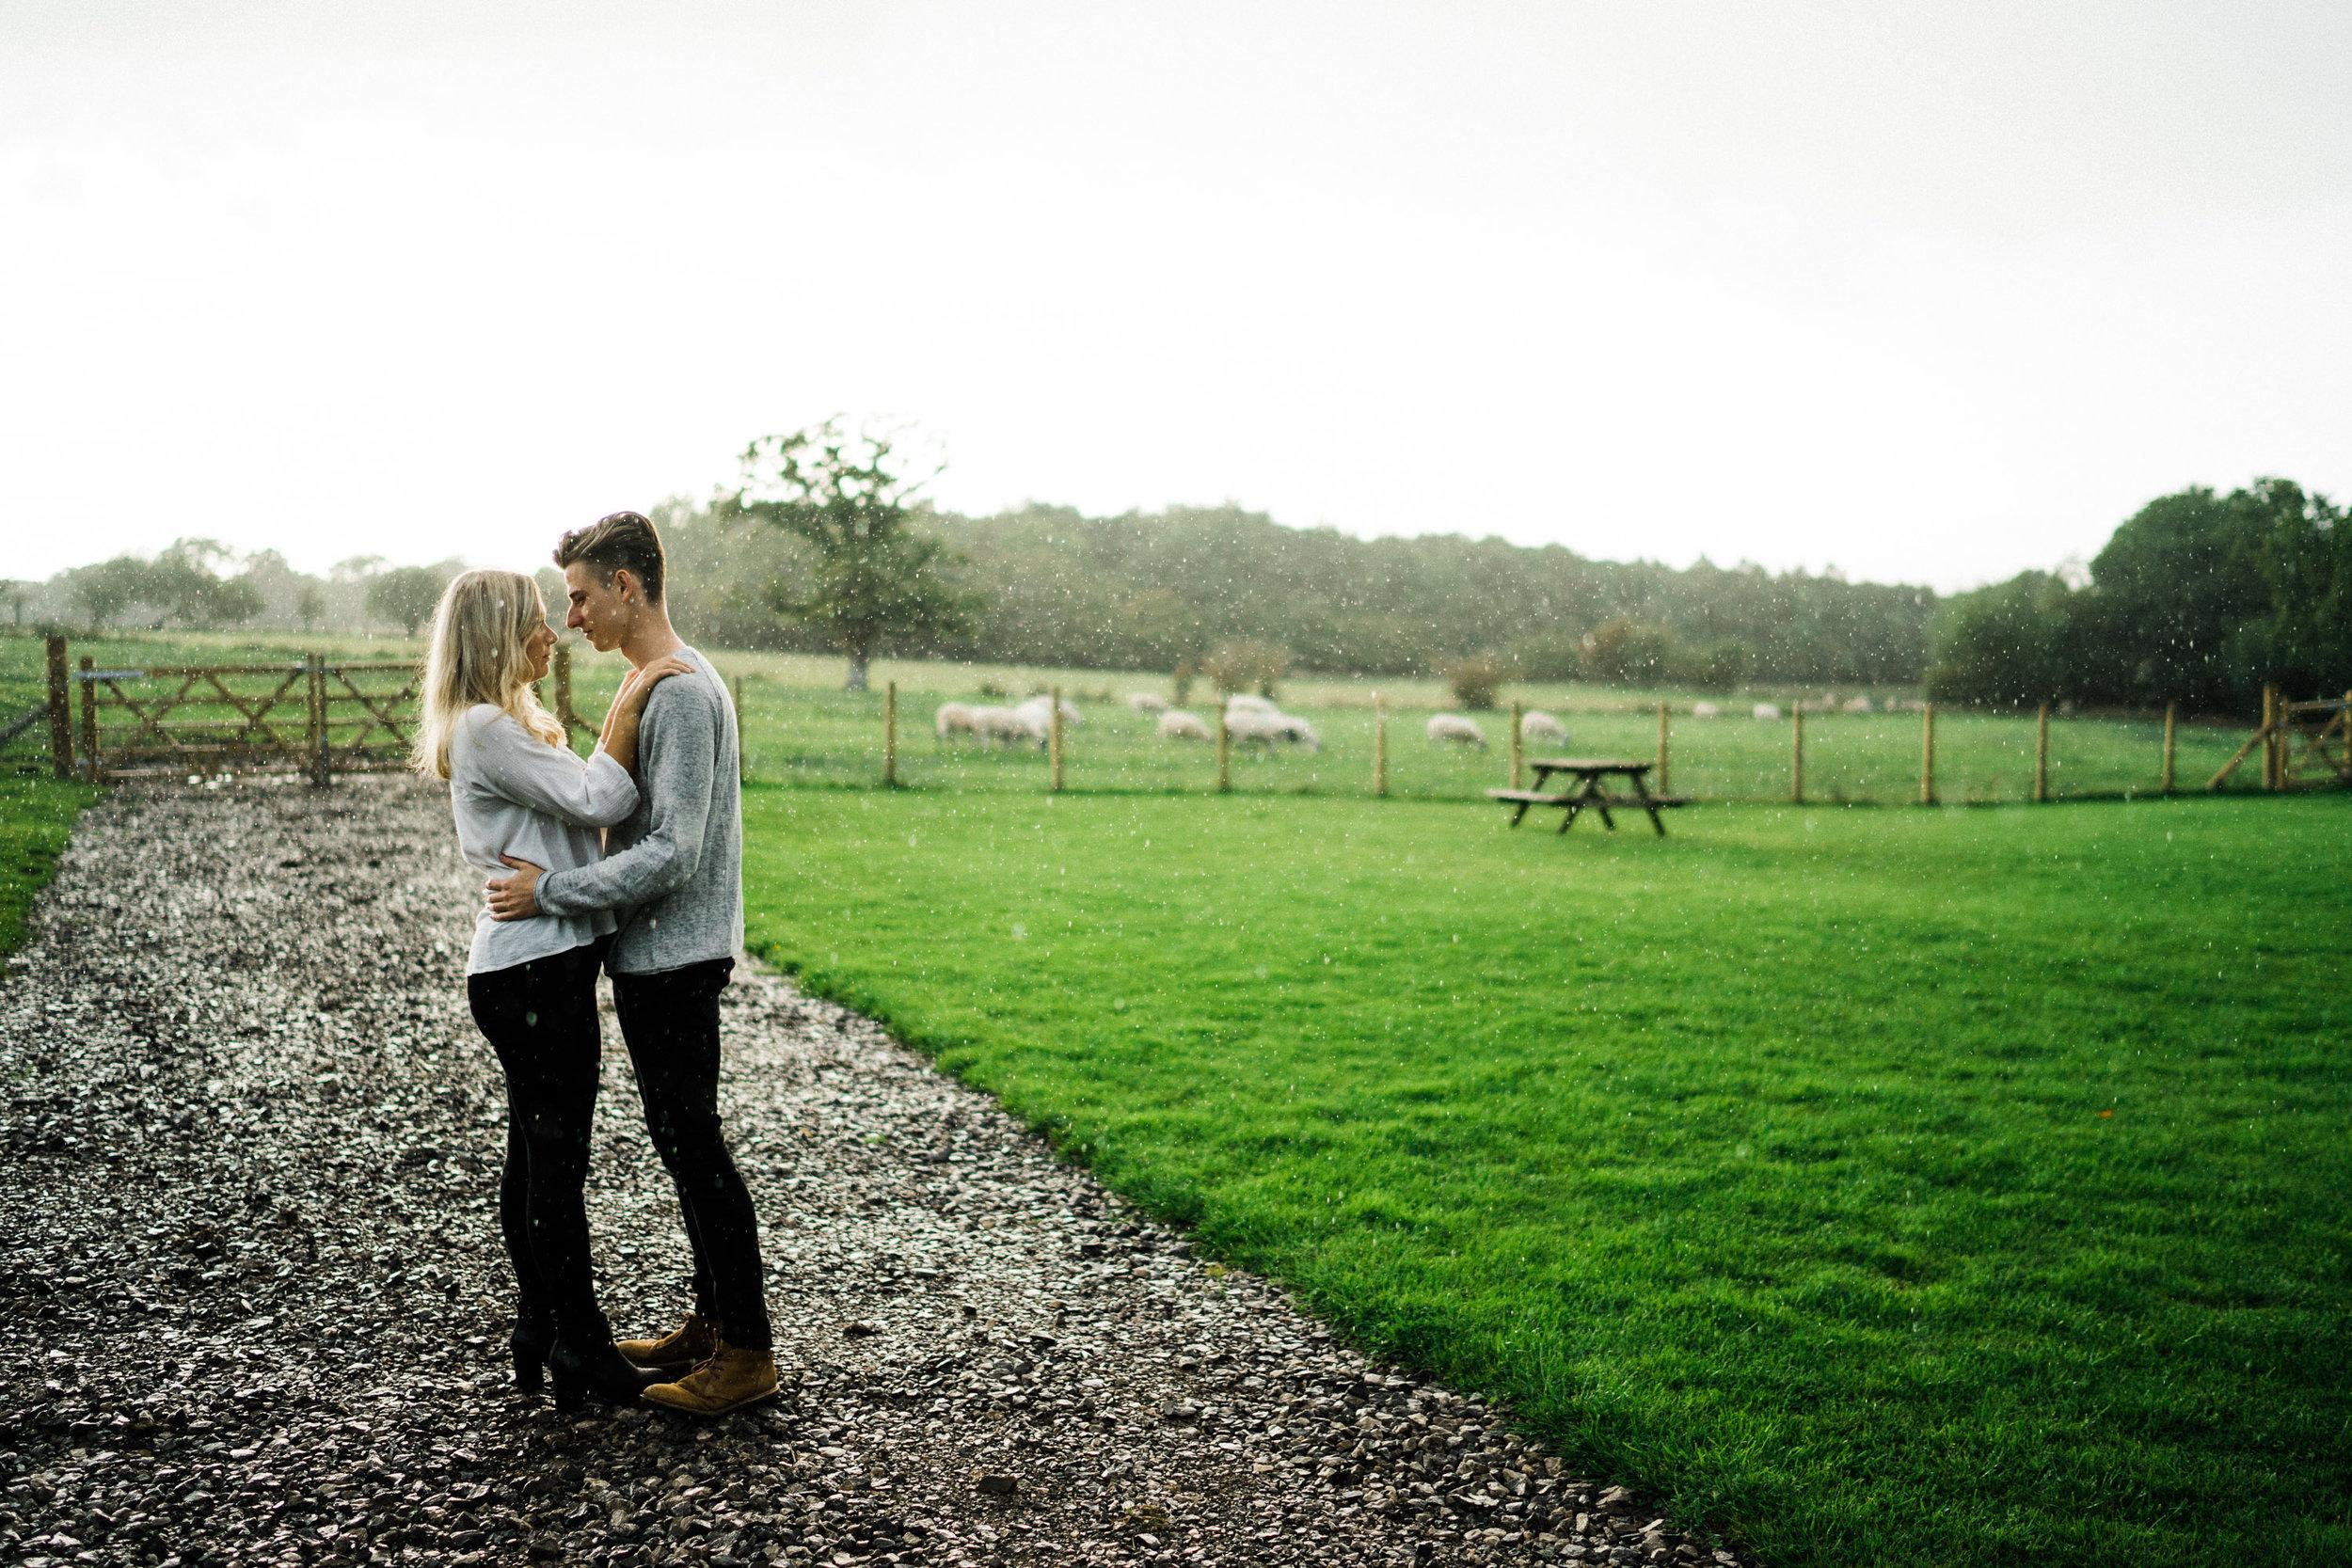 www.bytomw.com - Tom Wright - Manchester & Lake District Wedding Photographer -01114.jpg